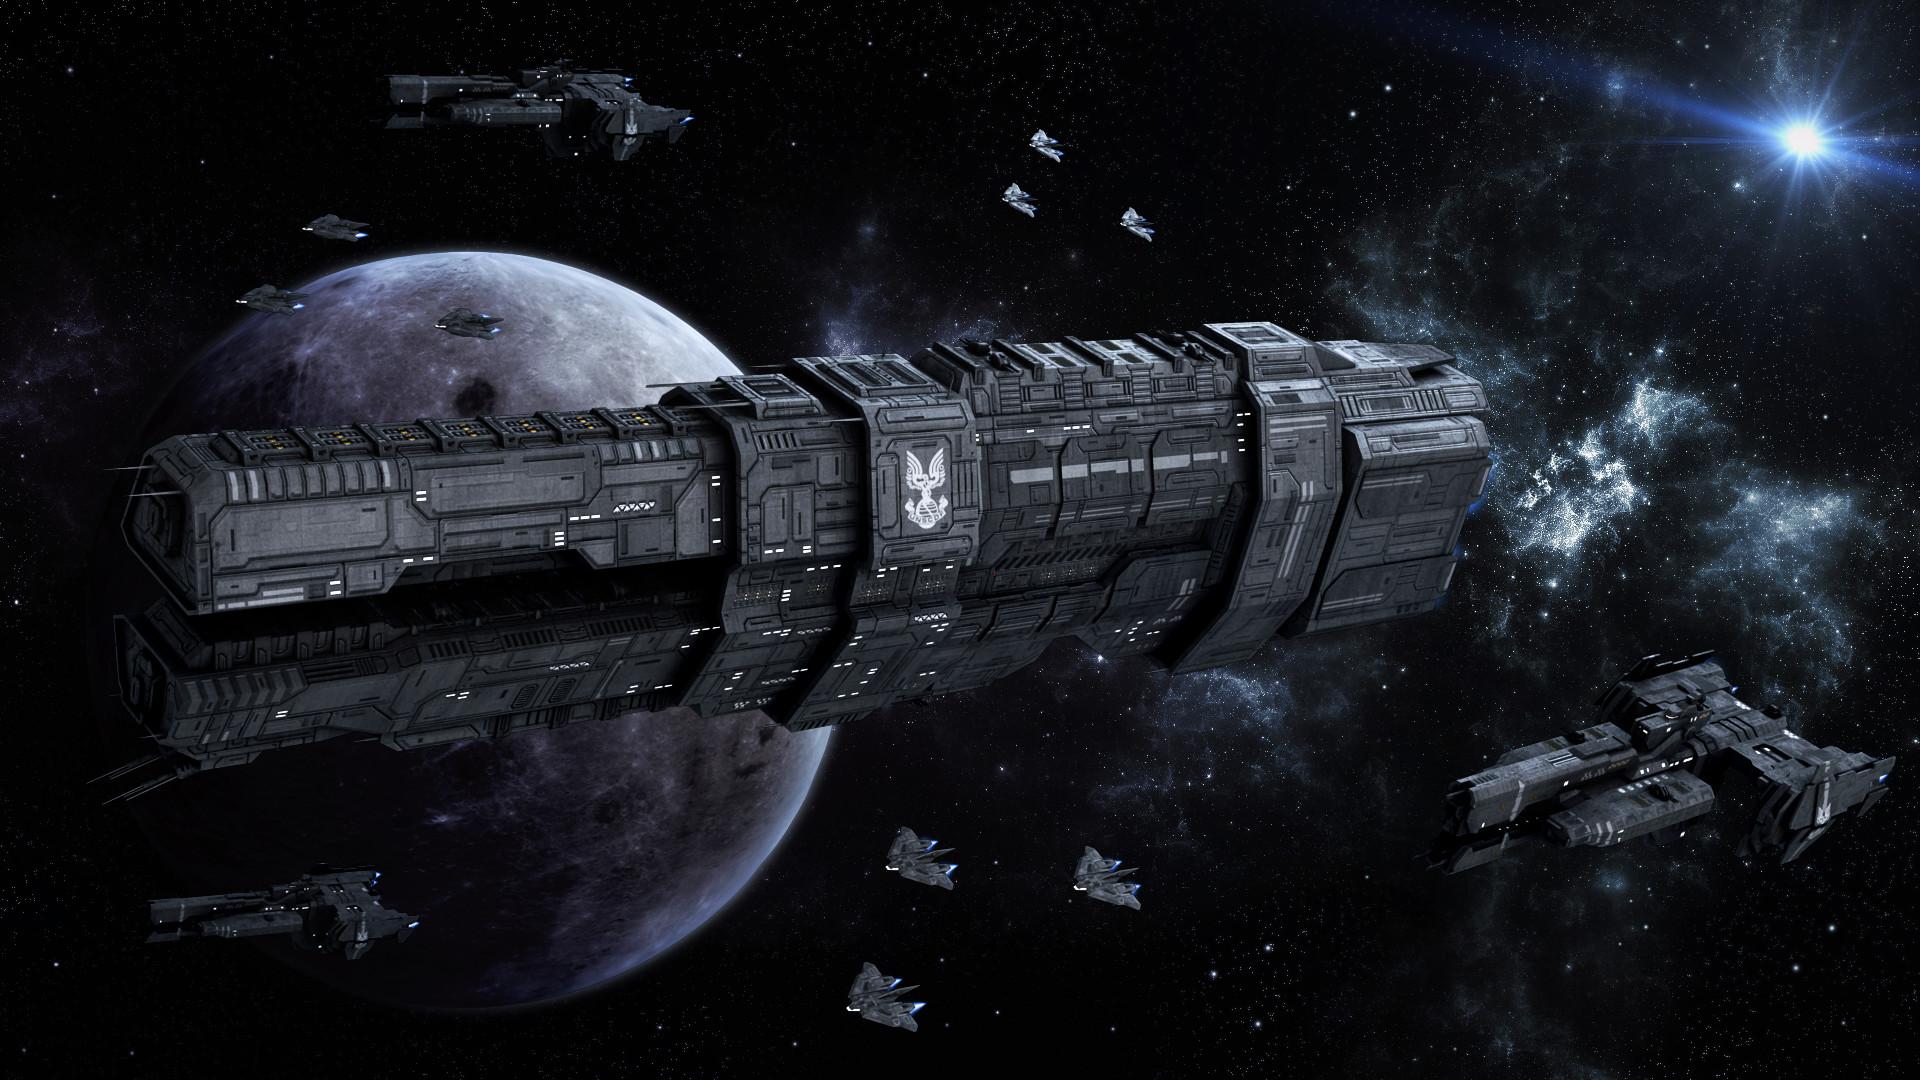 Res: 1920x1080, Description Orion battle spaceshipjpg